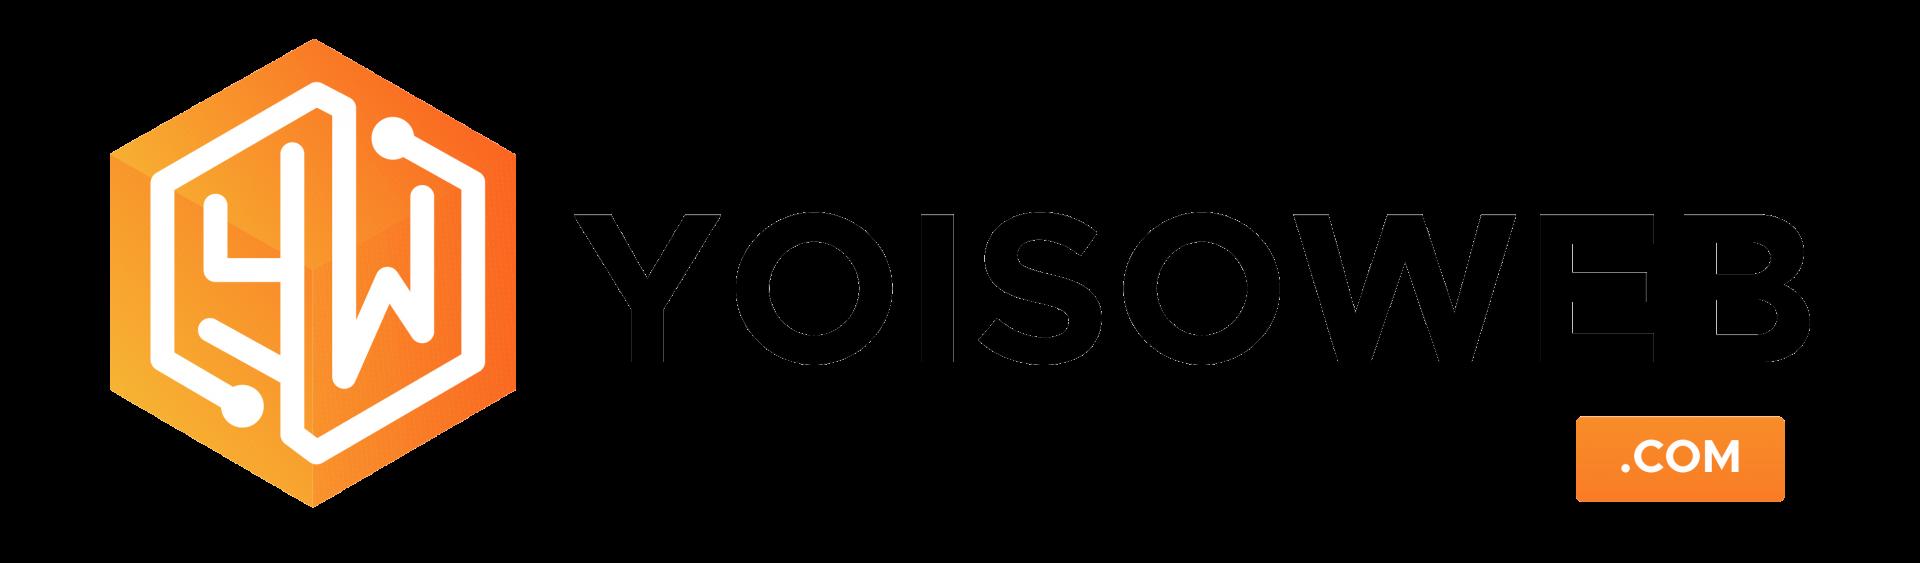 Jasa Digital Marketing |Pembuatan website Perusahaan | Website Toko Online| Jasa Admin